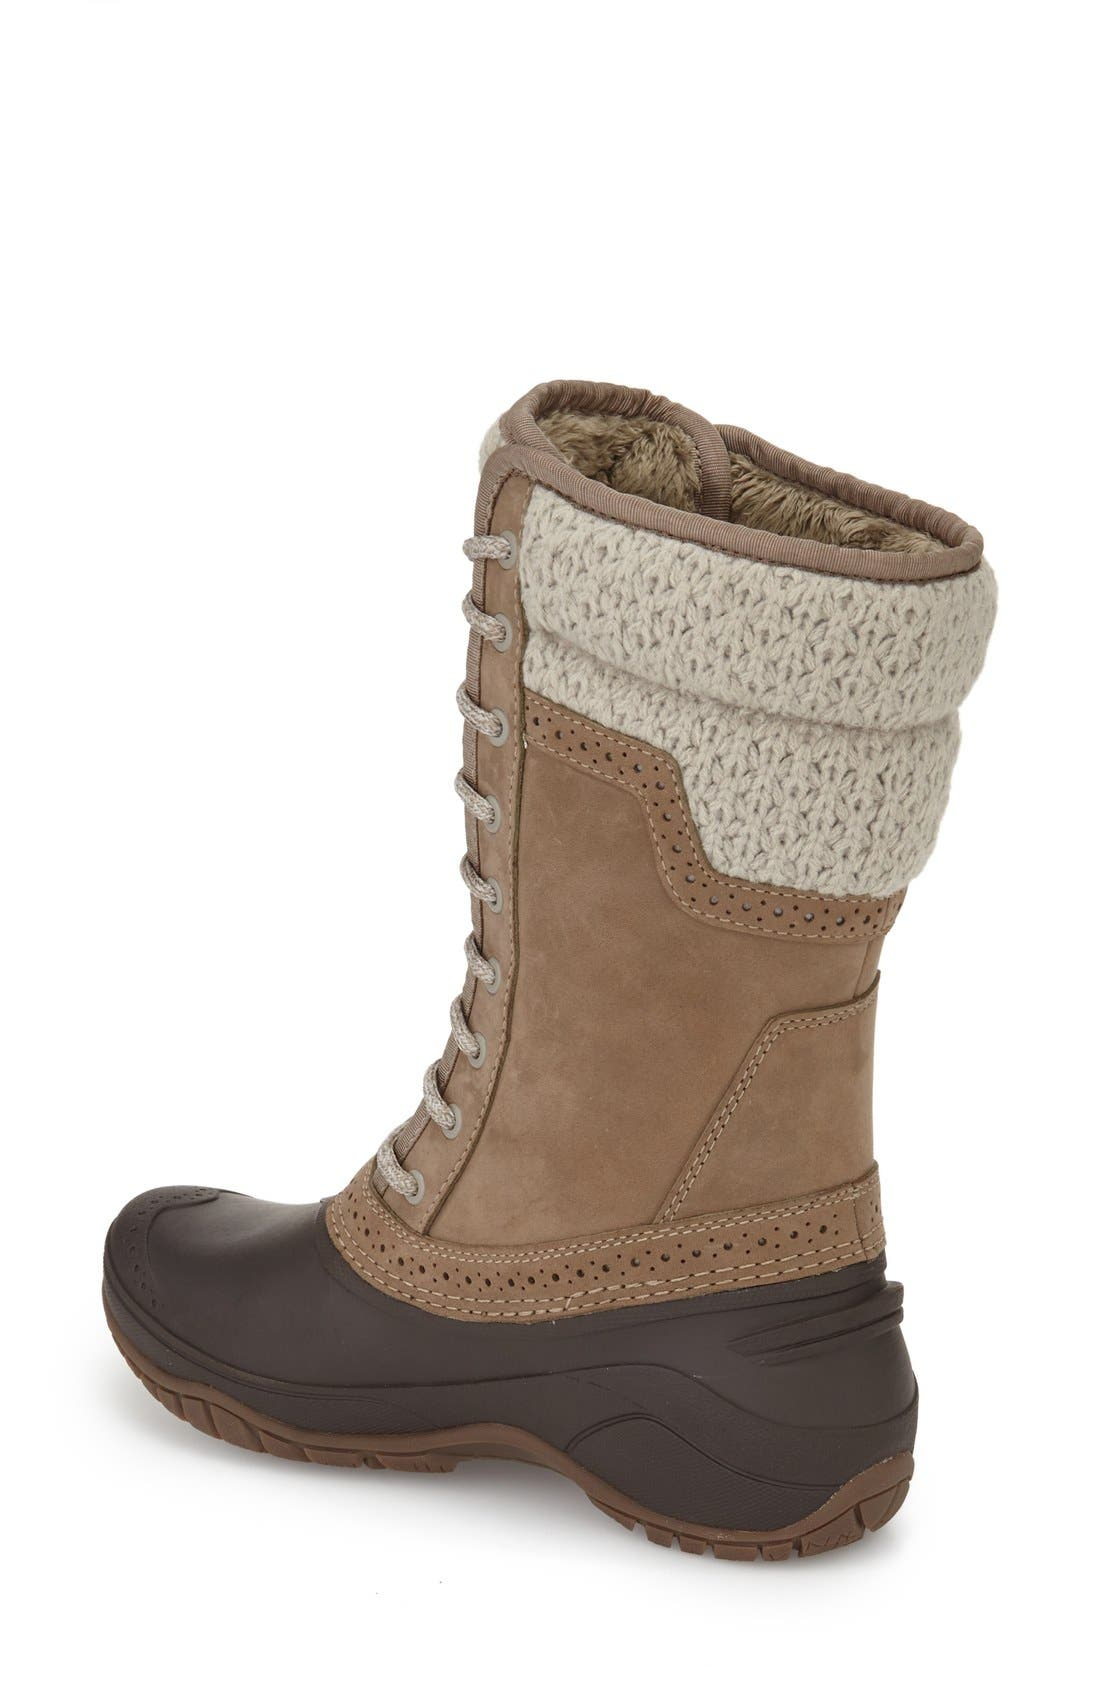 Shellista Waterproof Insulated Snow Boot,                             Alternate thumbnail 2, color,                             Split Rock Brown/ Dove Grey